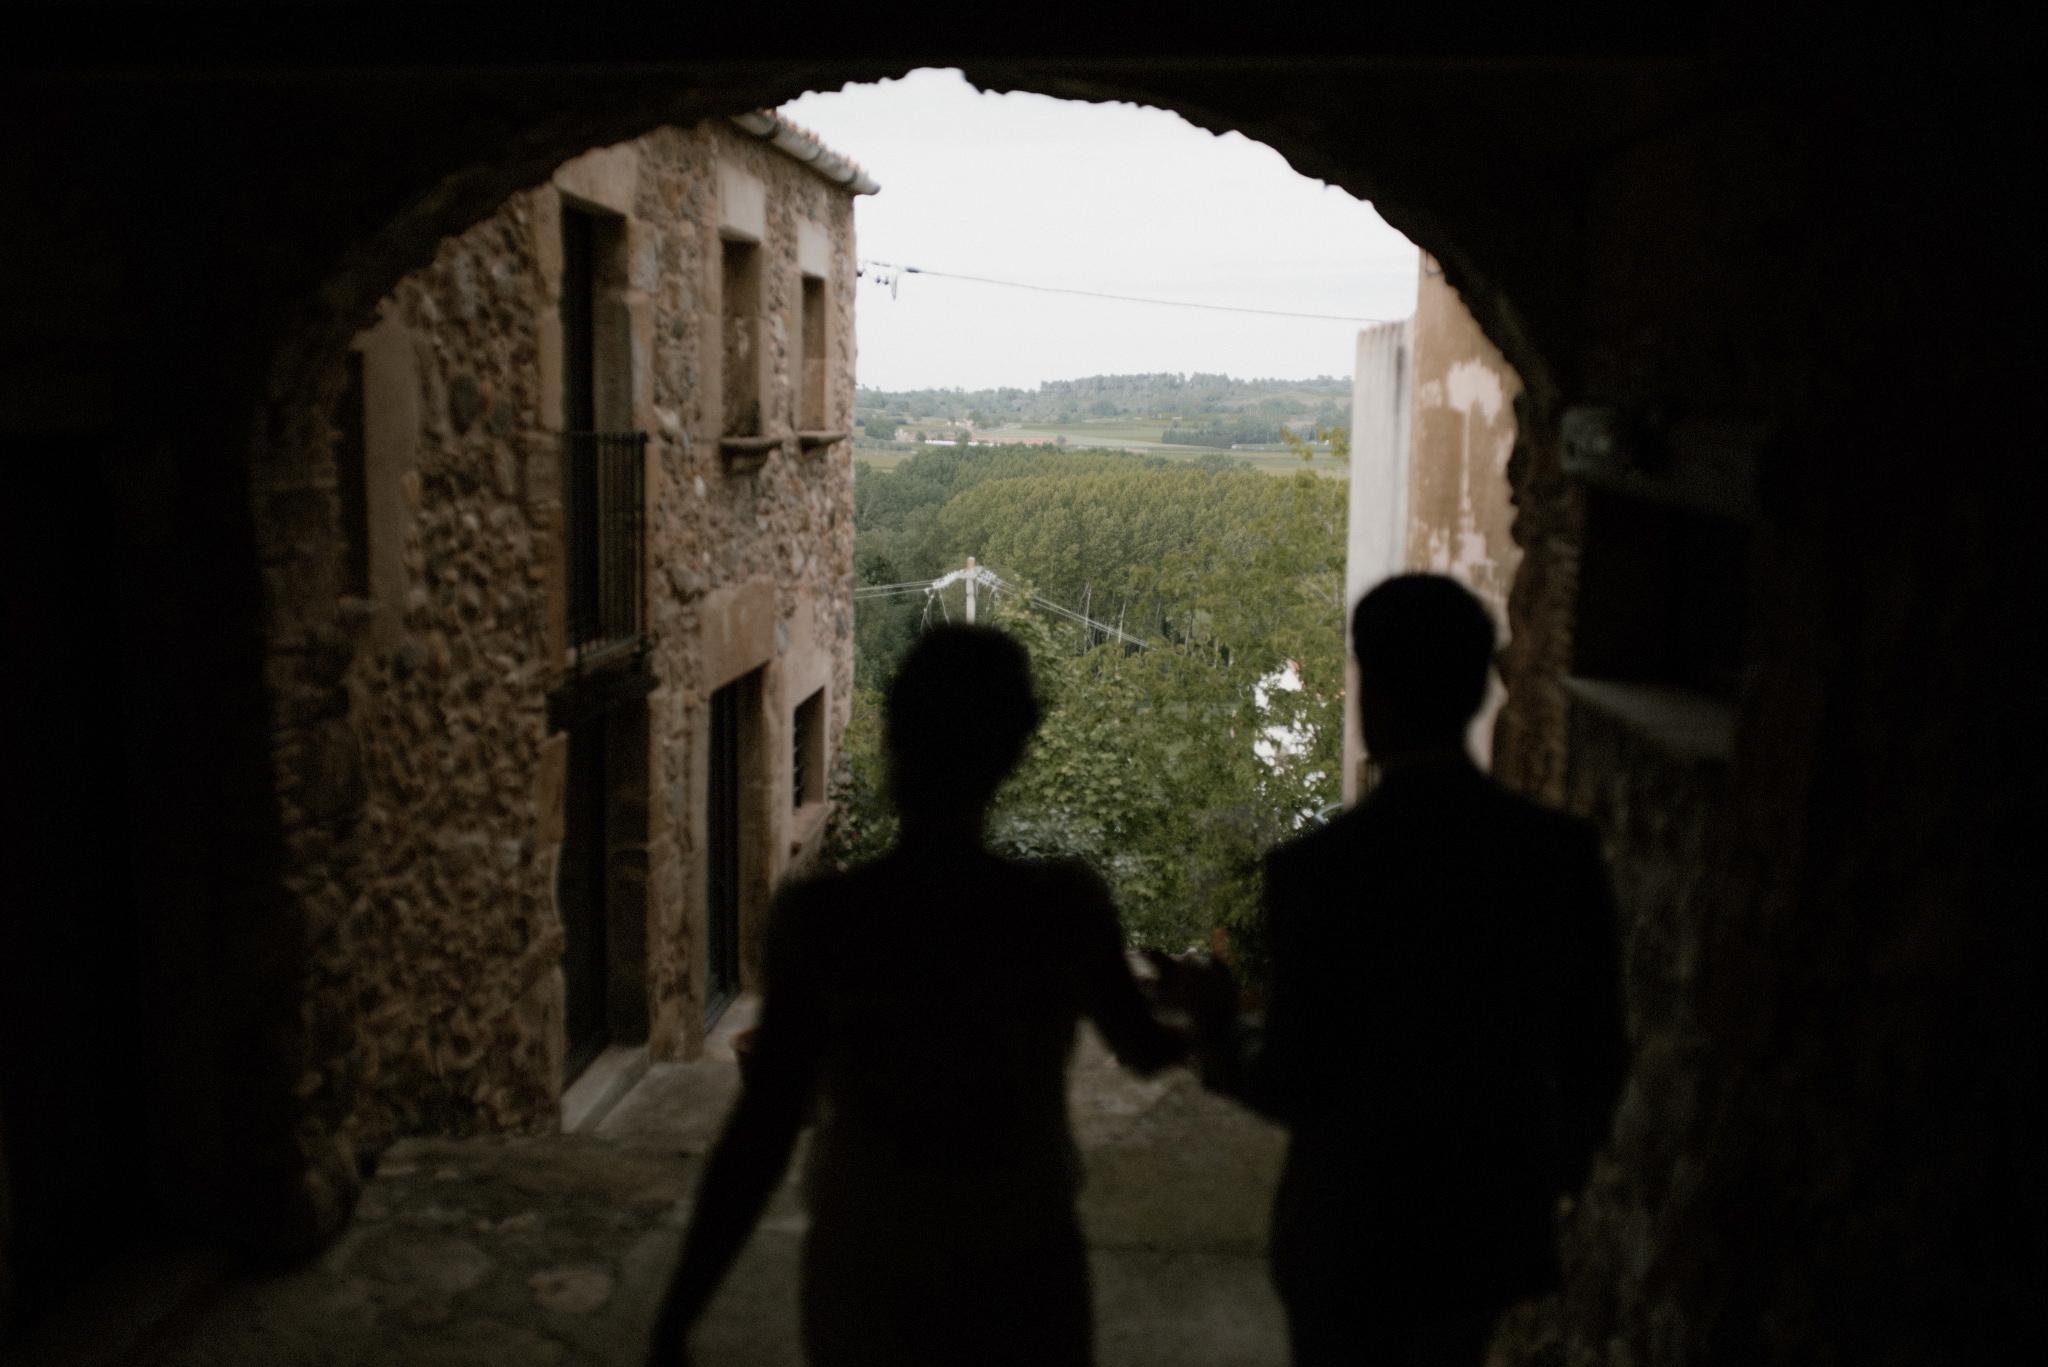 Bruidsfotograaf Spanje Castle d'Emporda destination wedding Naomi van der Kraan00057.jpg